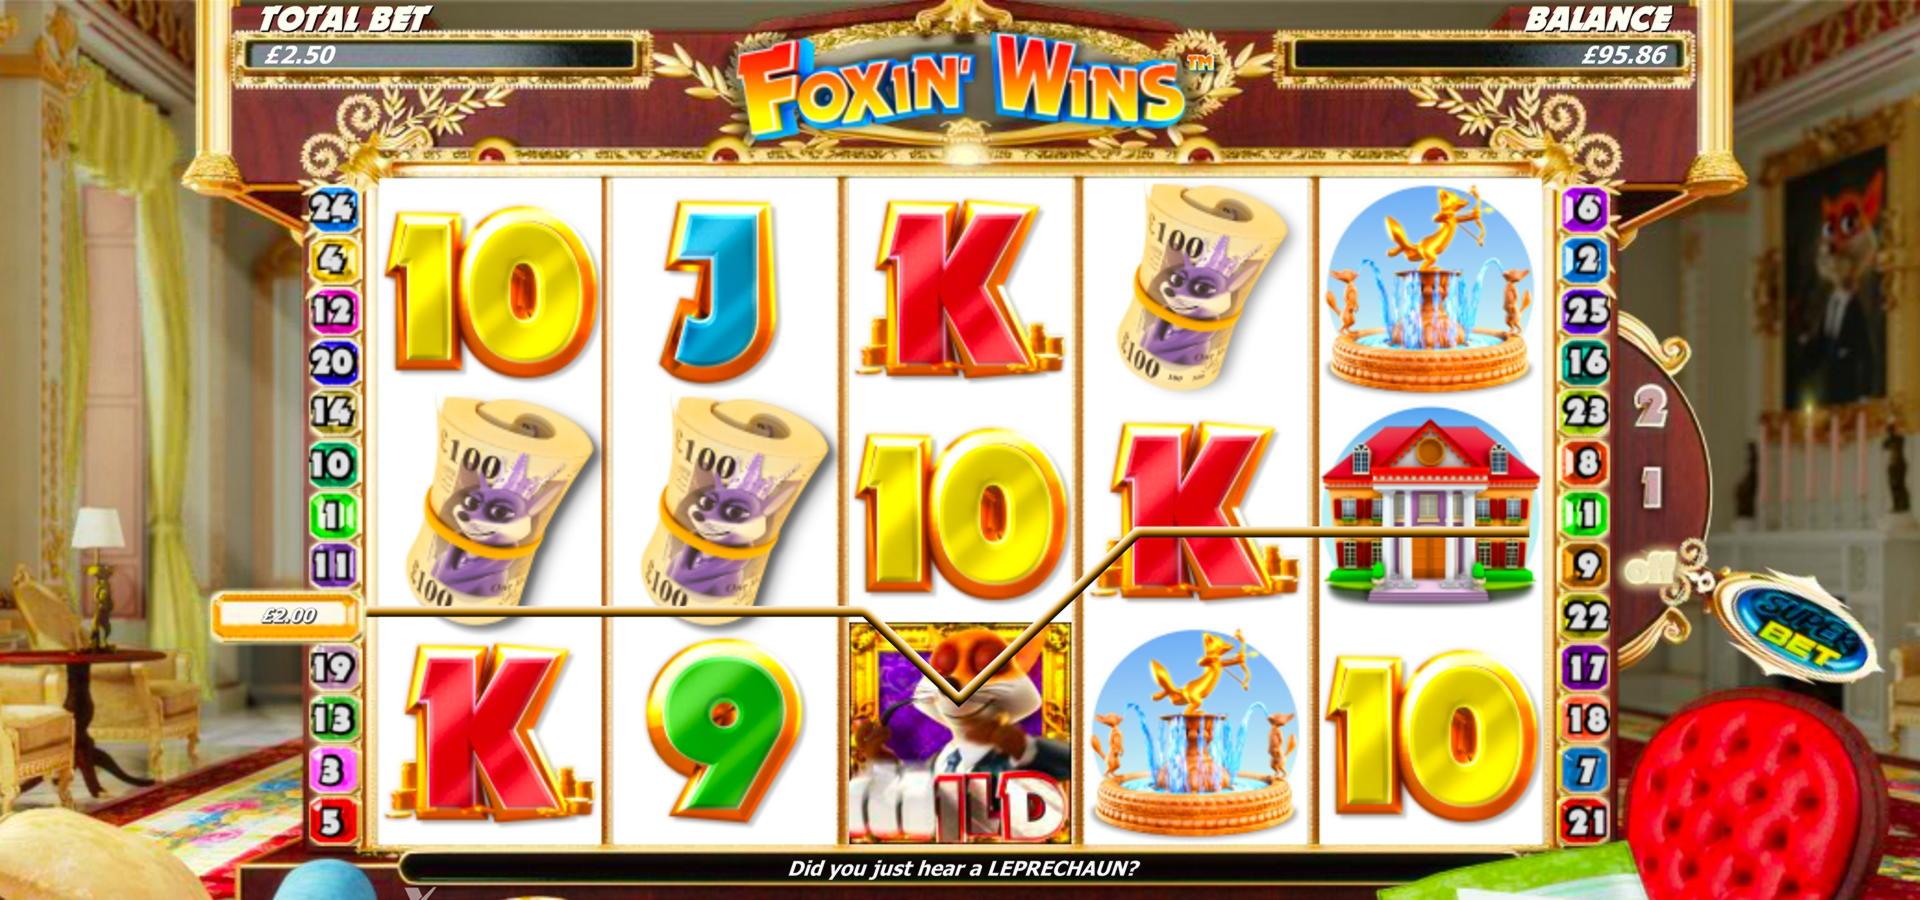 € Codice bonus 3035 senza deposito su Casino.com